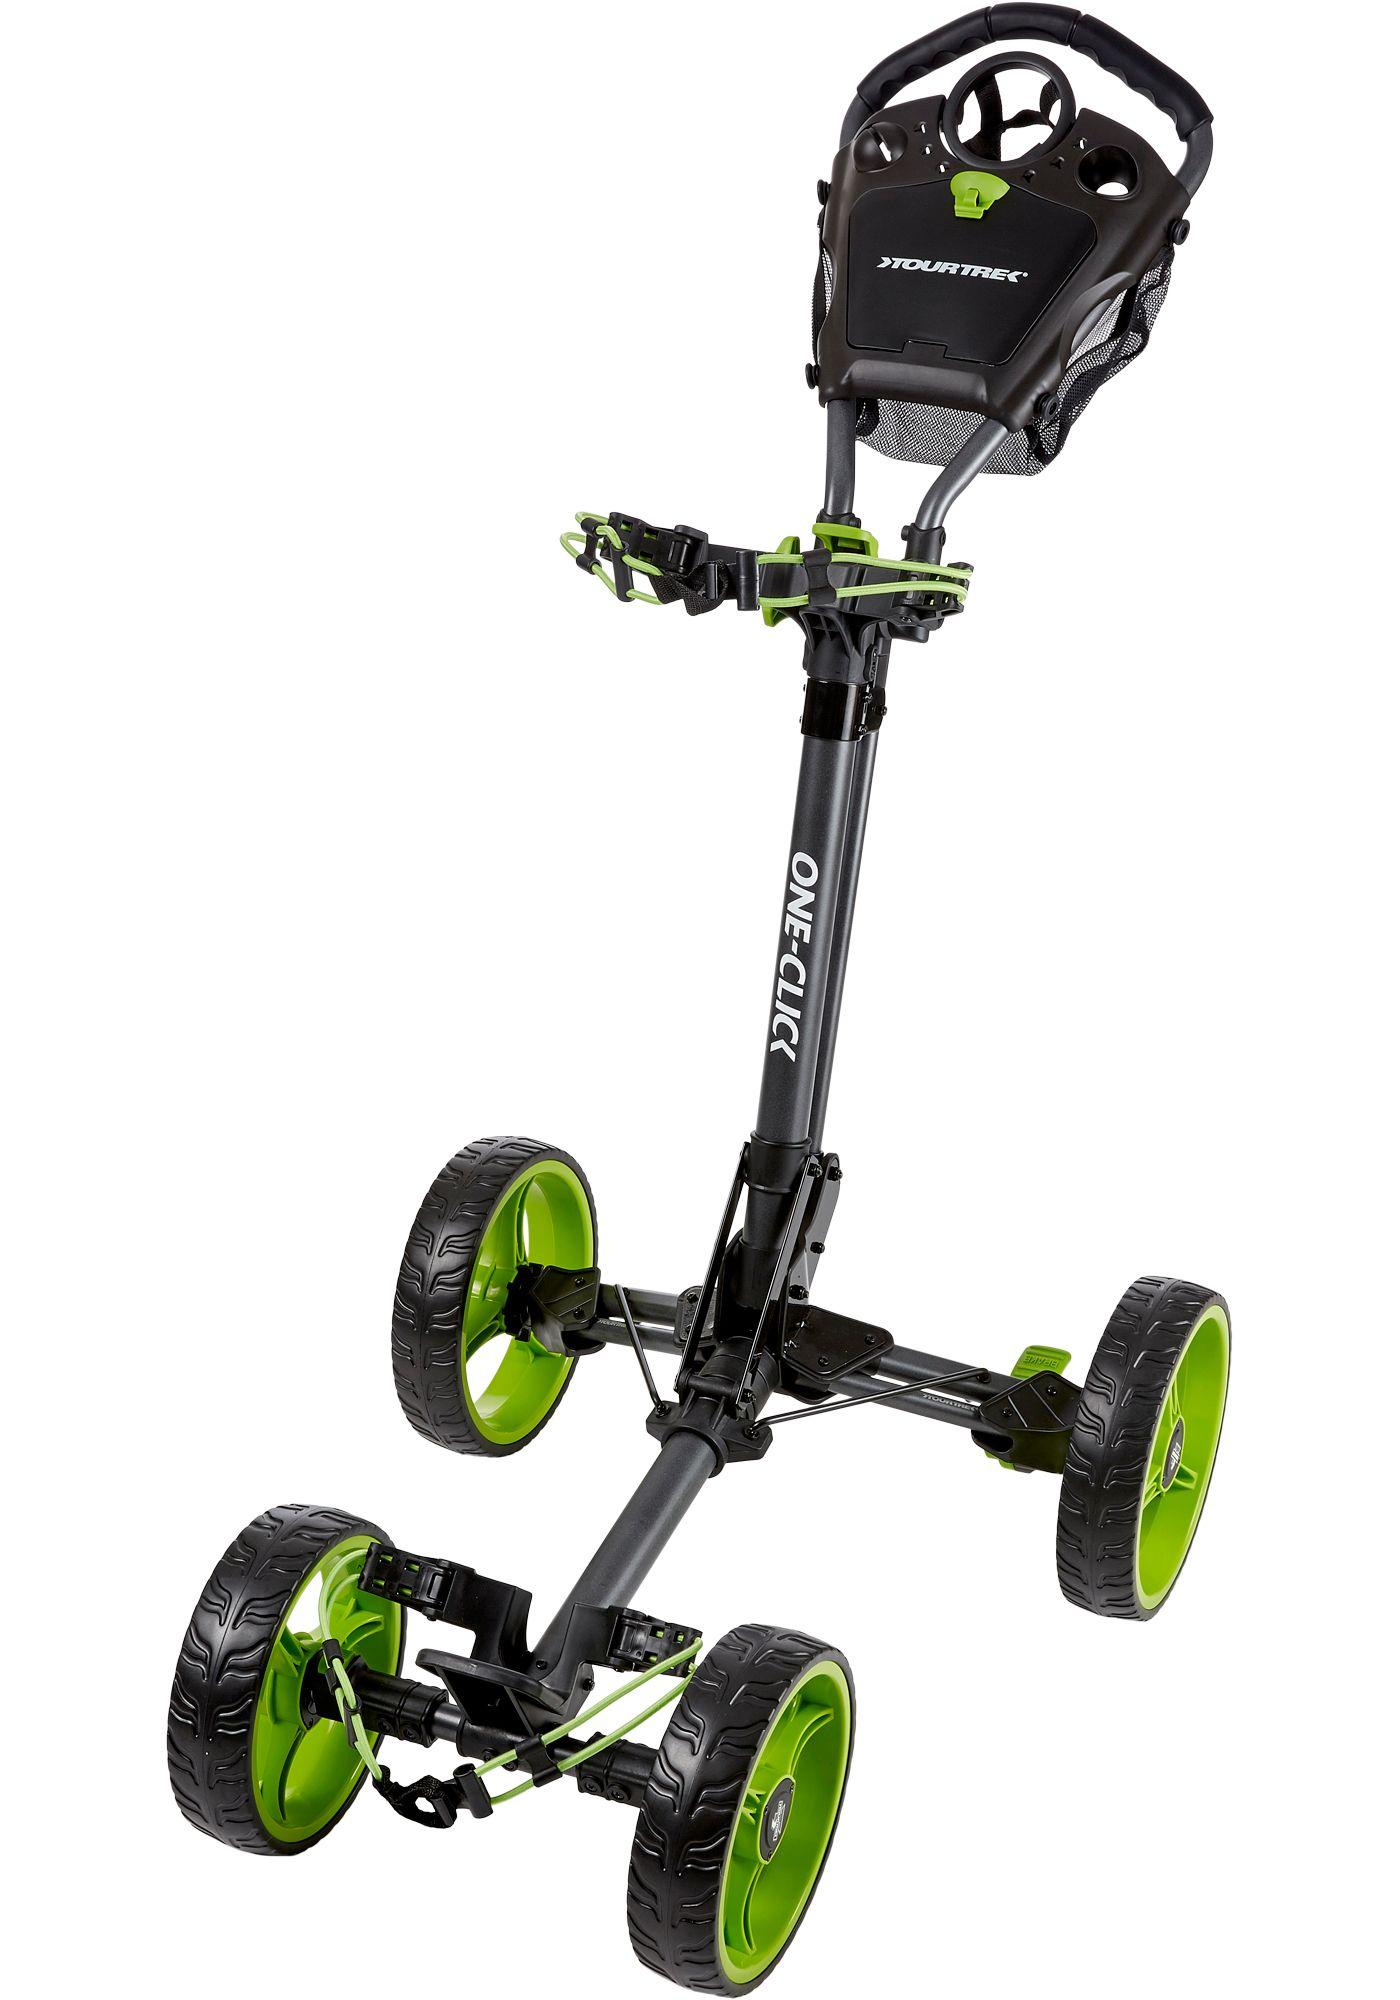 TourTrek 2018 One-Click 4-Wheel Push Cart